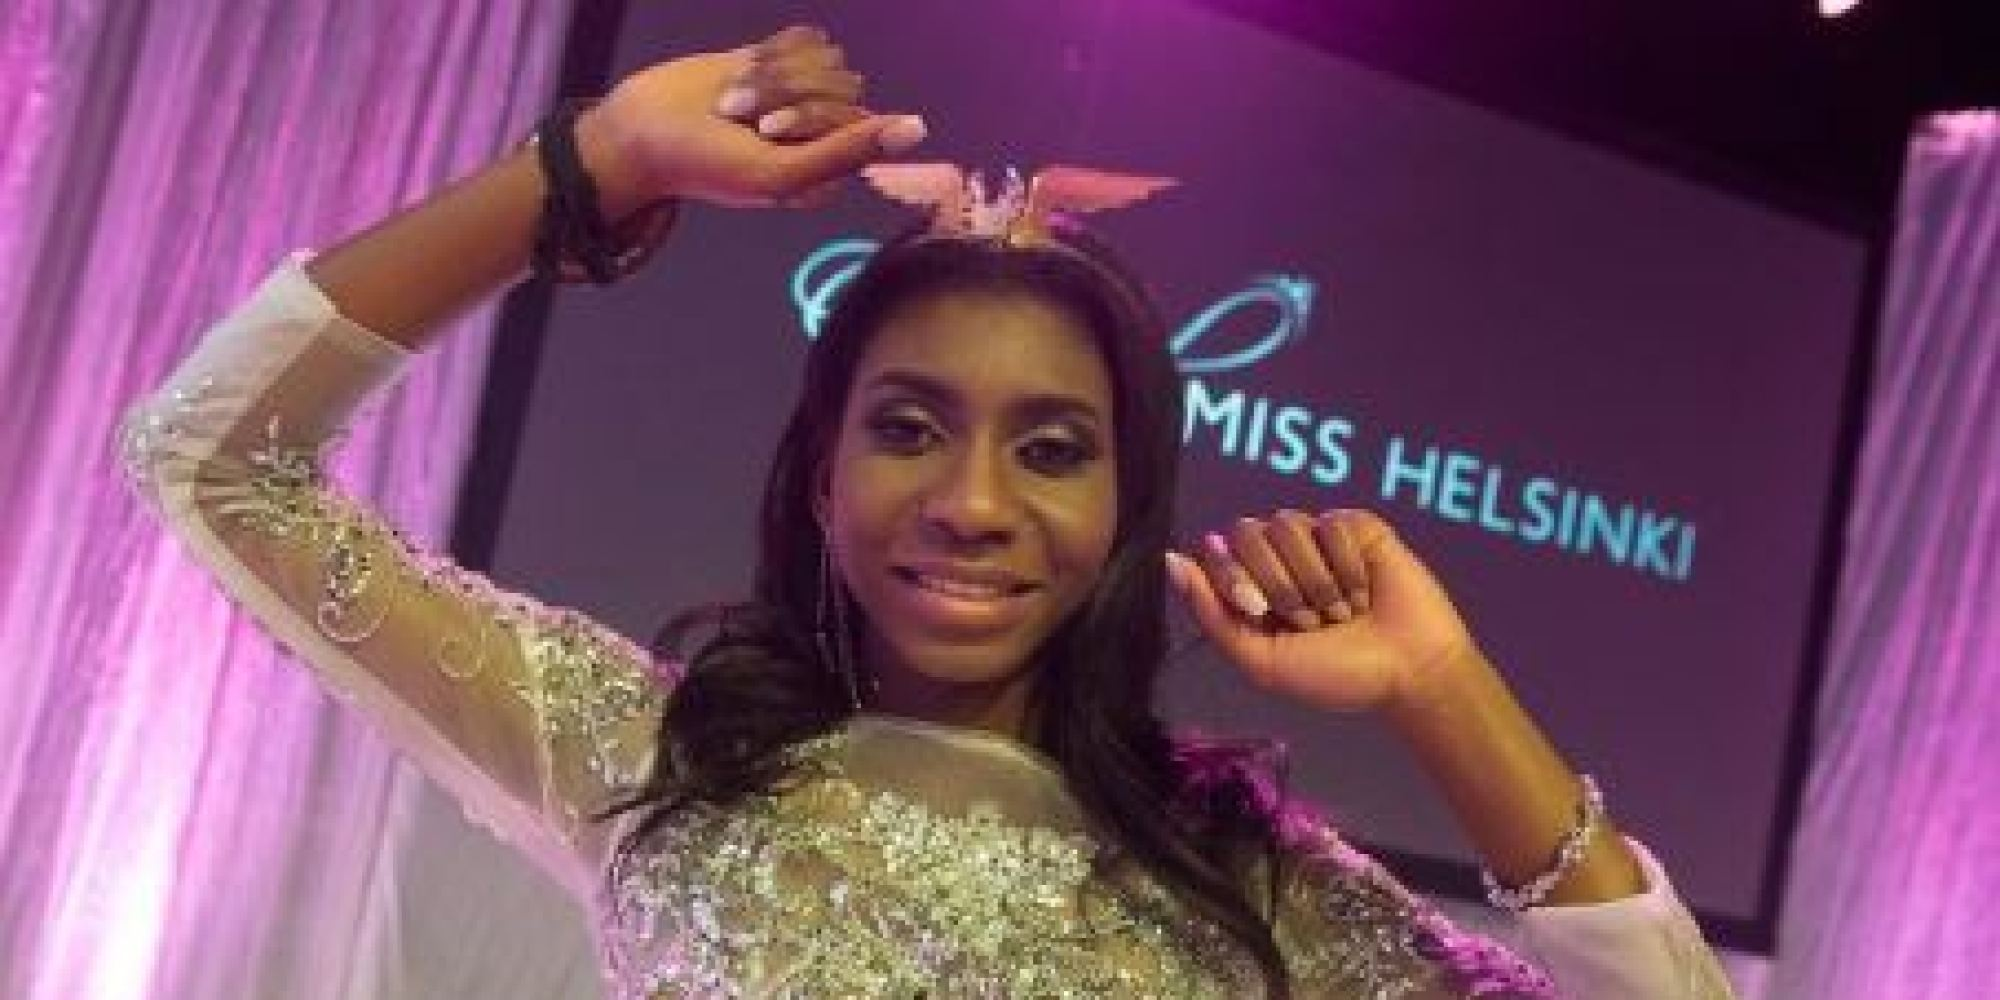 miss gay finland 2019 tuuli